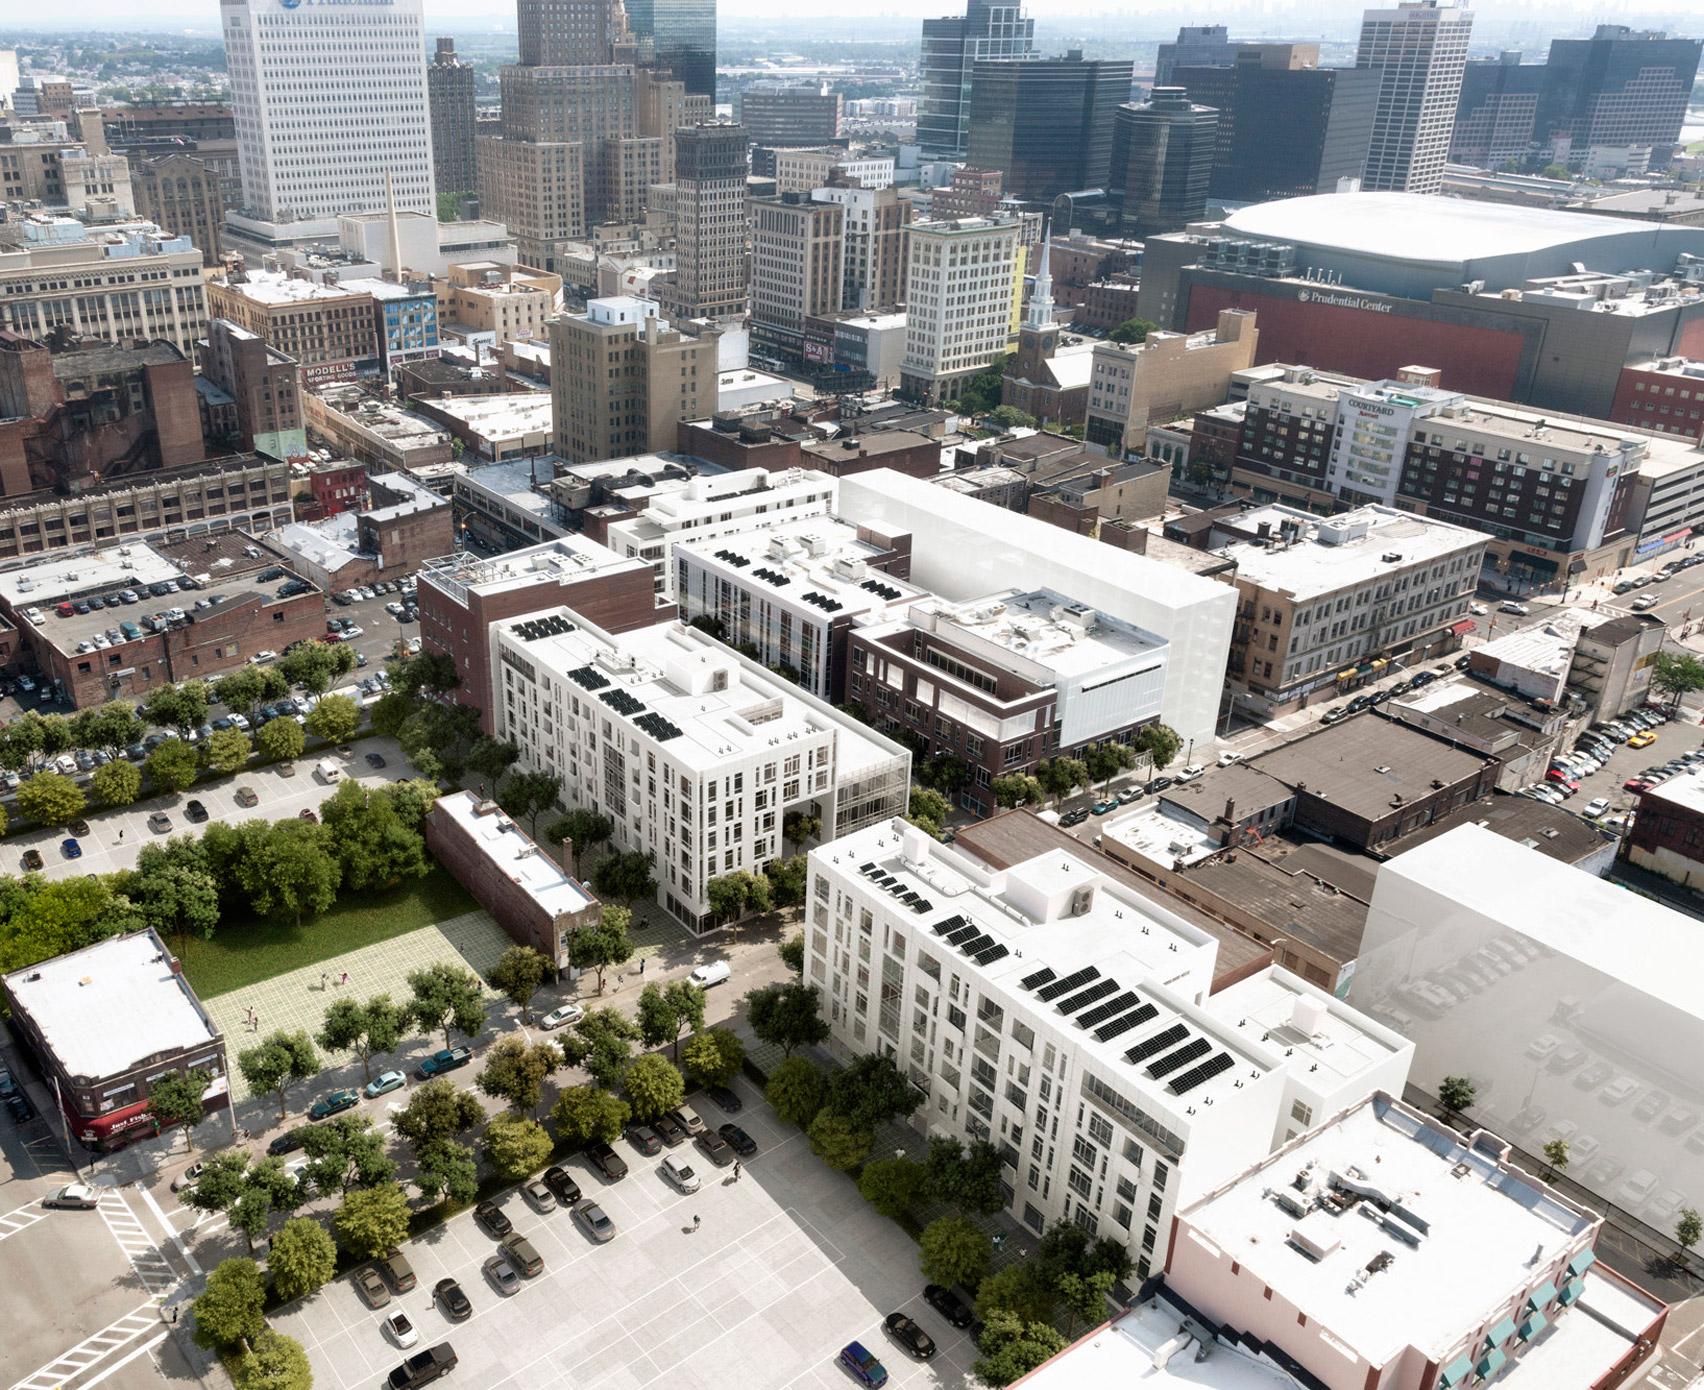 Richard Meier designs schools and teacher housing for his hometown in New Jersey